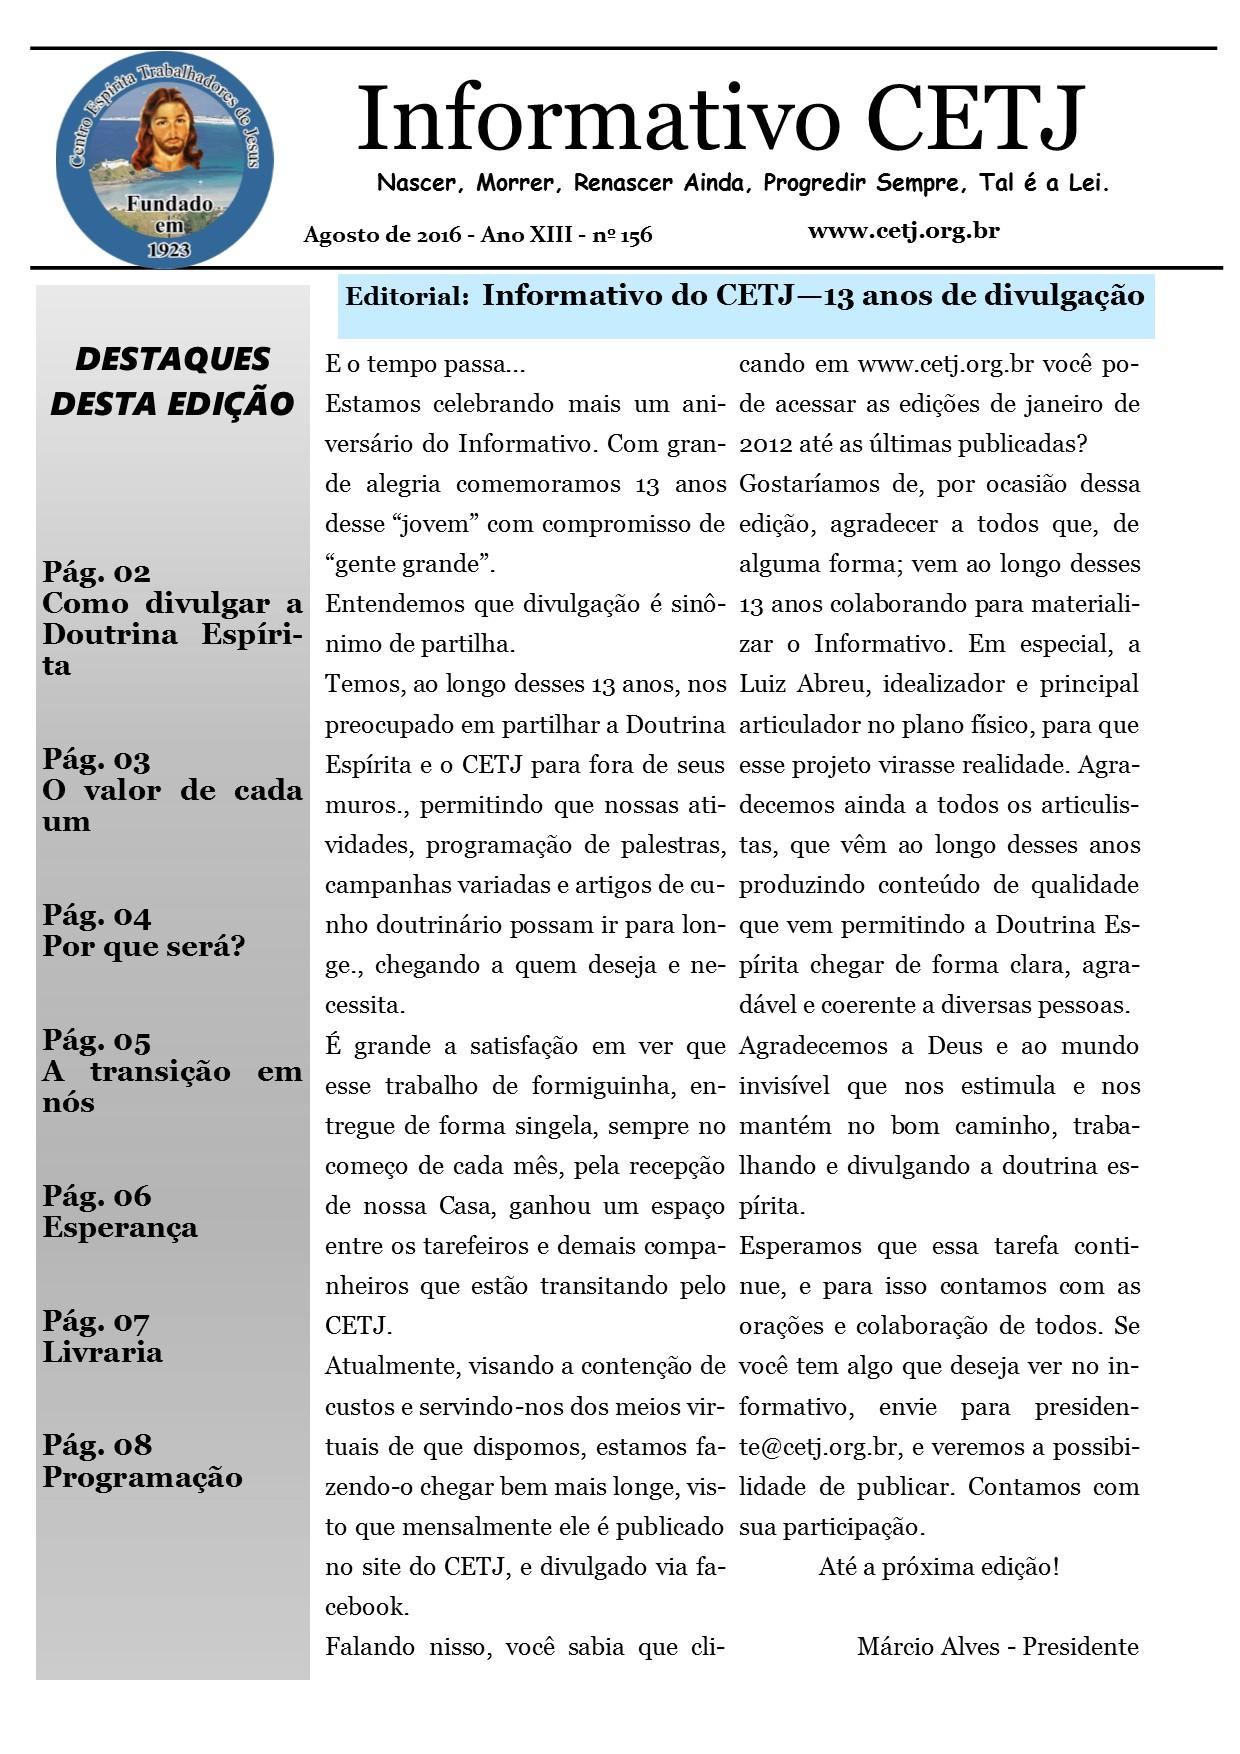 Informativo agosto de 2016_net